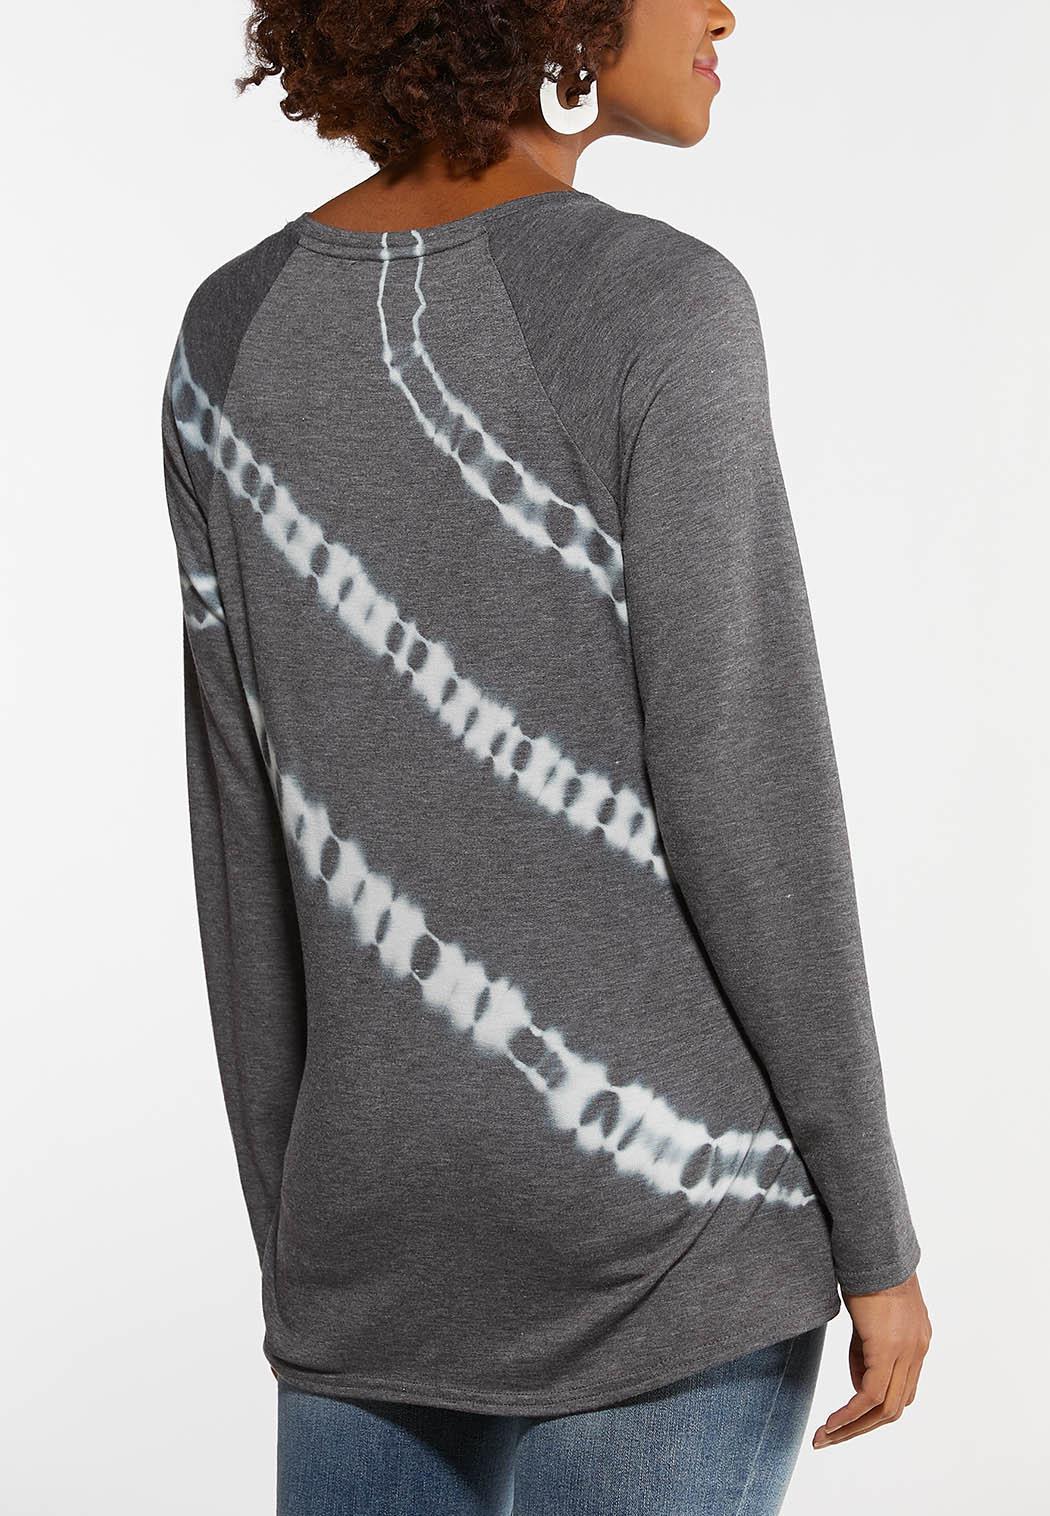 Gray Tie Dye Top (Item #44106951)